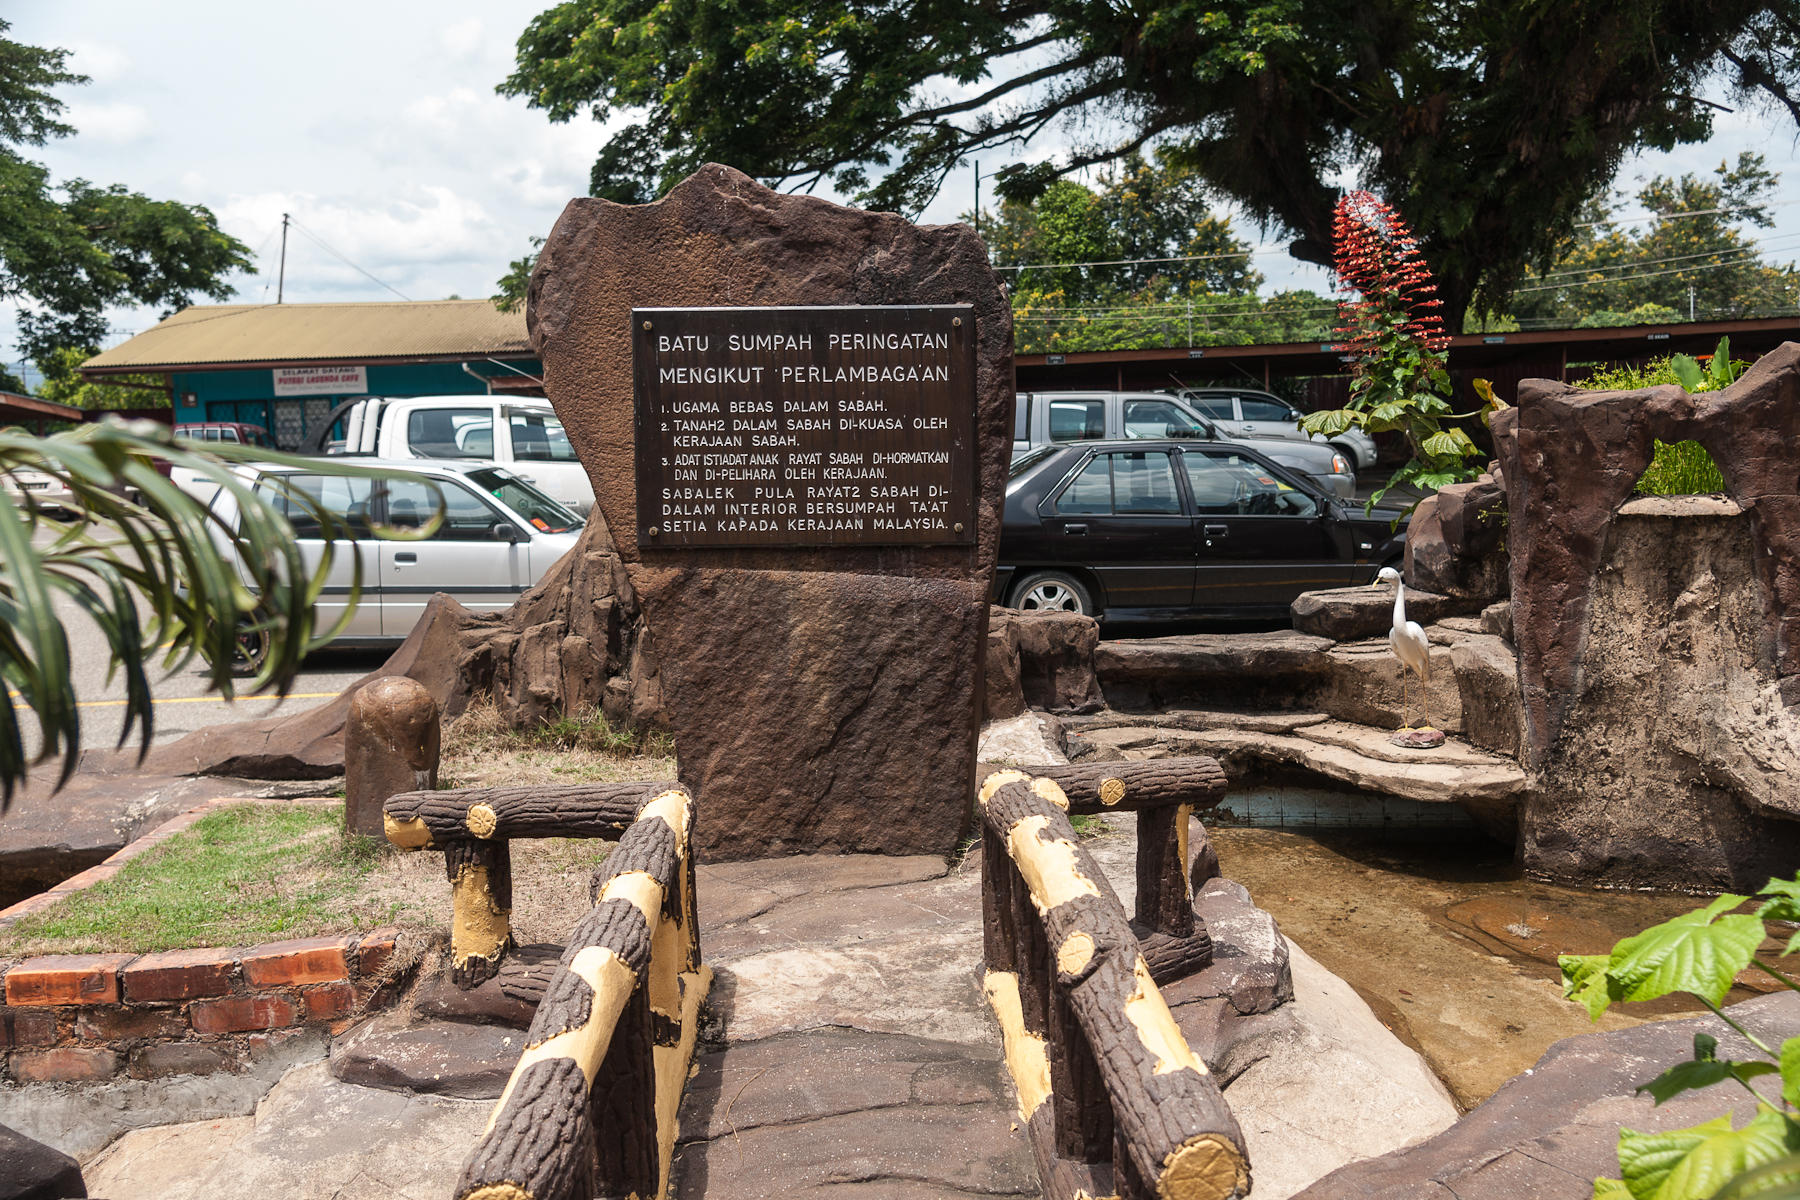 http://upload.wikimedia.org/wikipedia/commons/5/5b/Keningau_Sabah_BatuSumpahKeningau-01.jpg